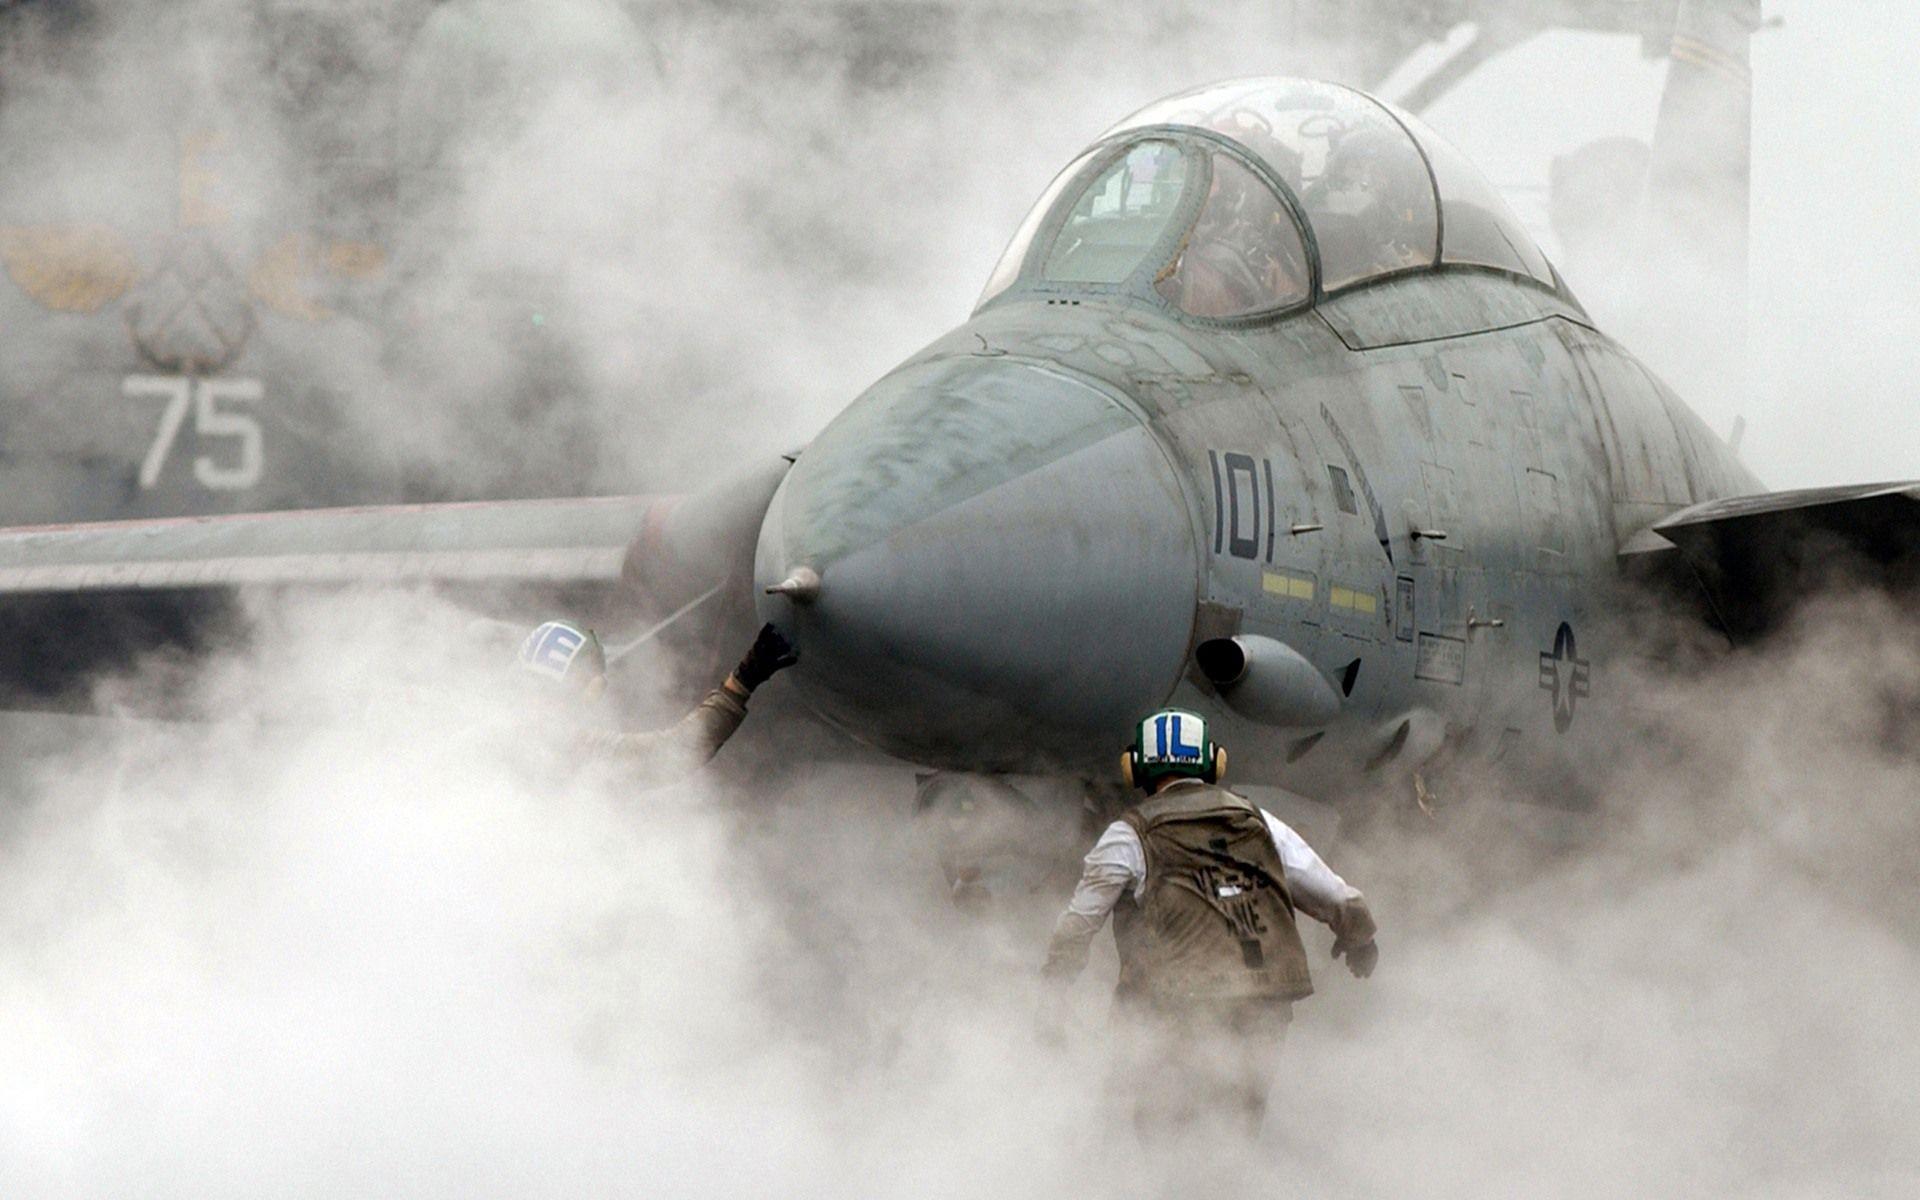 Fighter Aircraft War Plane Wallpaper For Desktop and Mobile ...